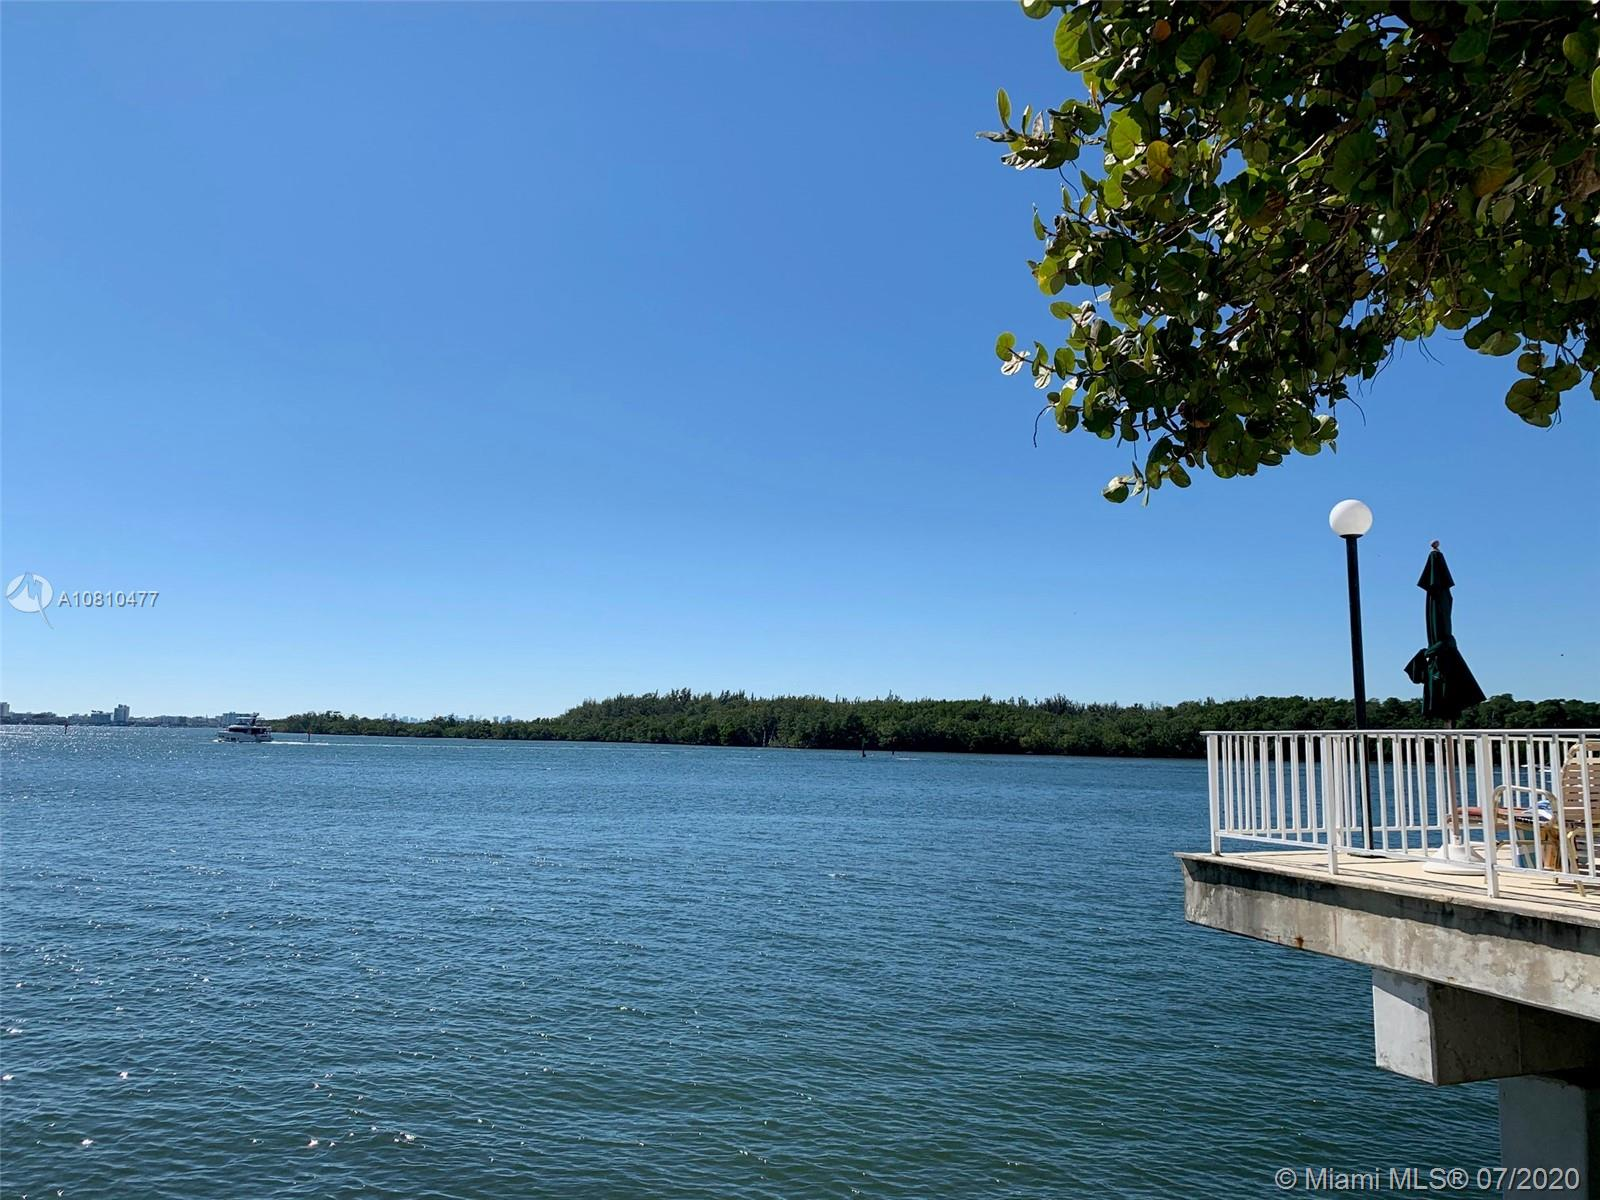 300 Bayview Dr #207, Sunny Isles Beach, FL 33160 - Sunny Isles Beach, FL real estate listing